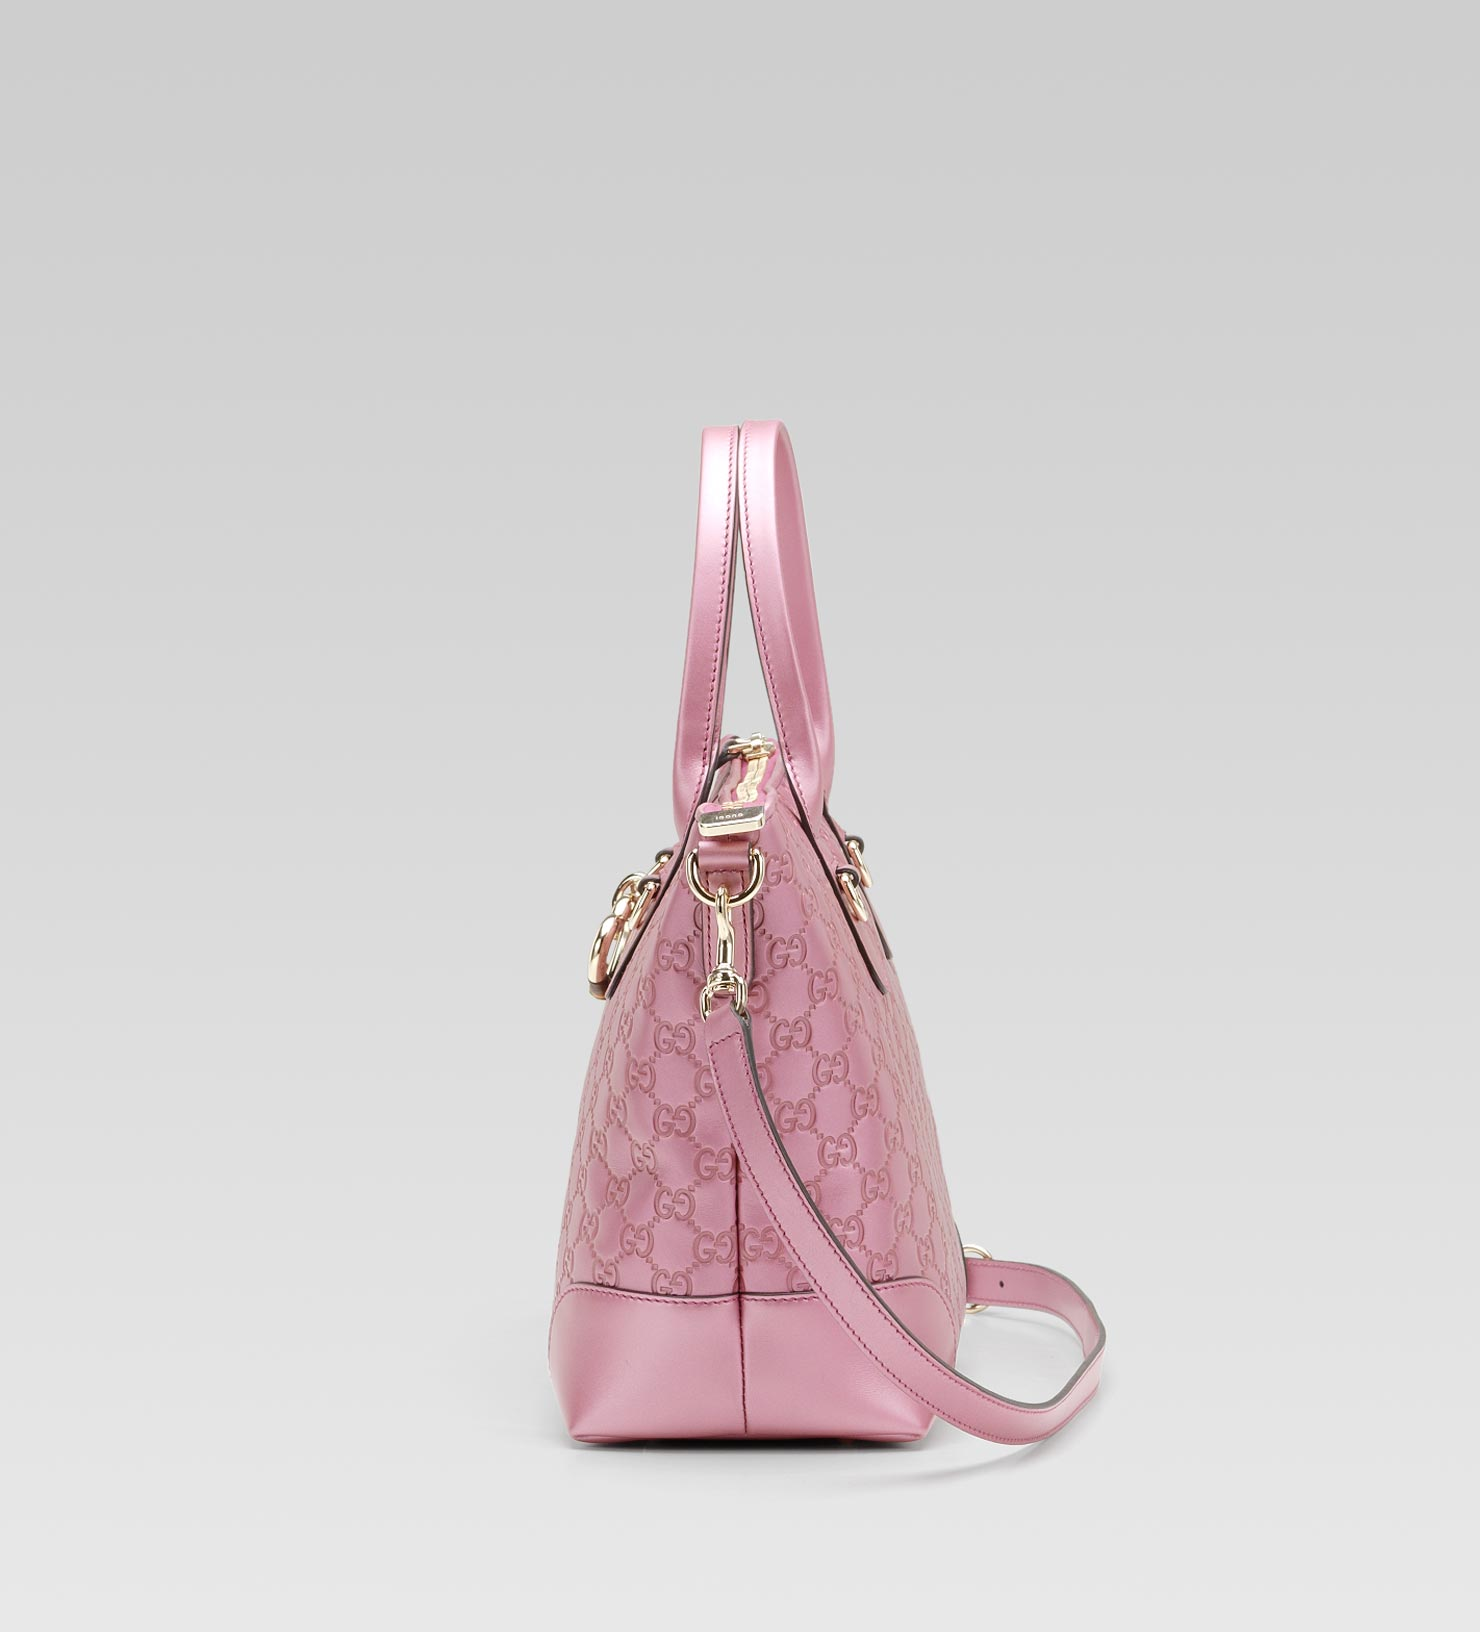 e4ea299a2e59 Gucci Heart Bit Charm Top Handle Bag in Pink - Lyst